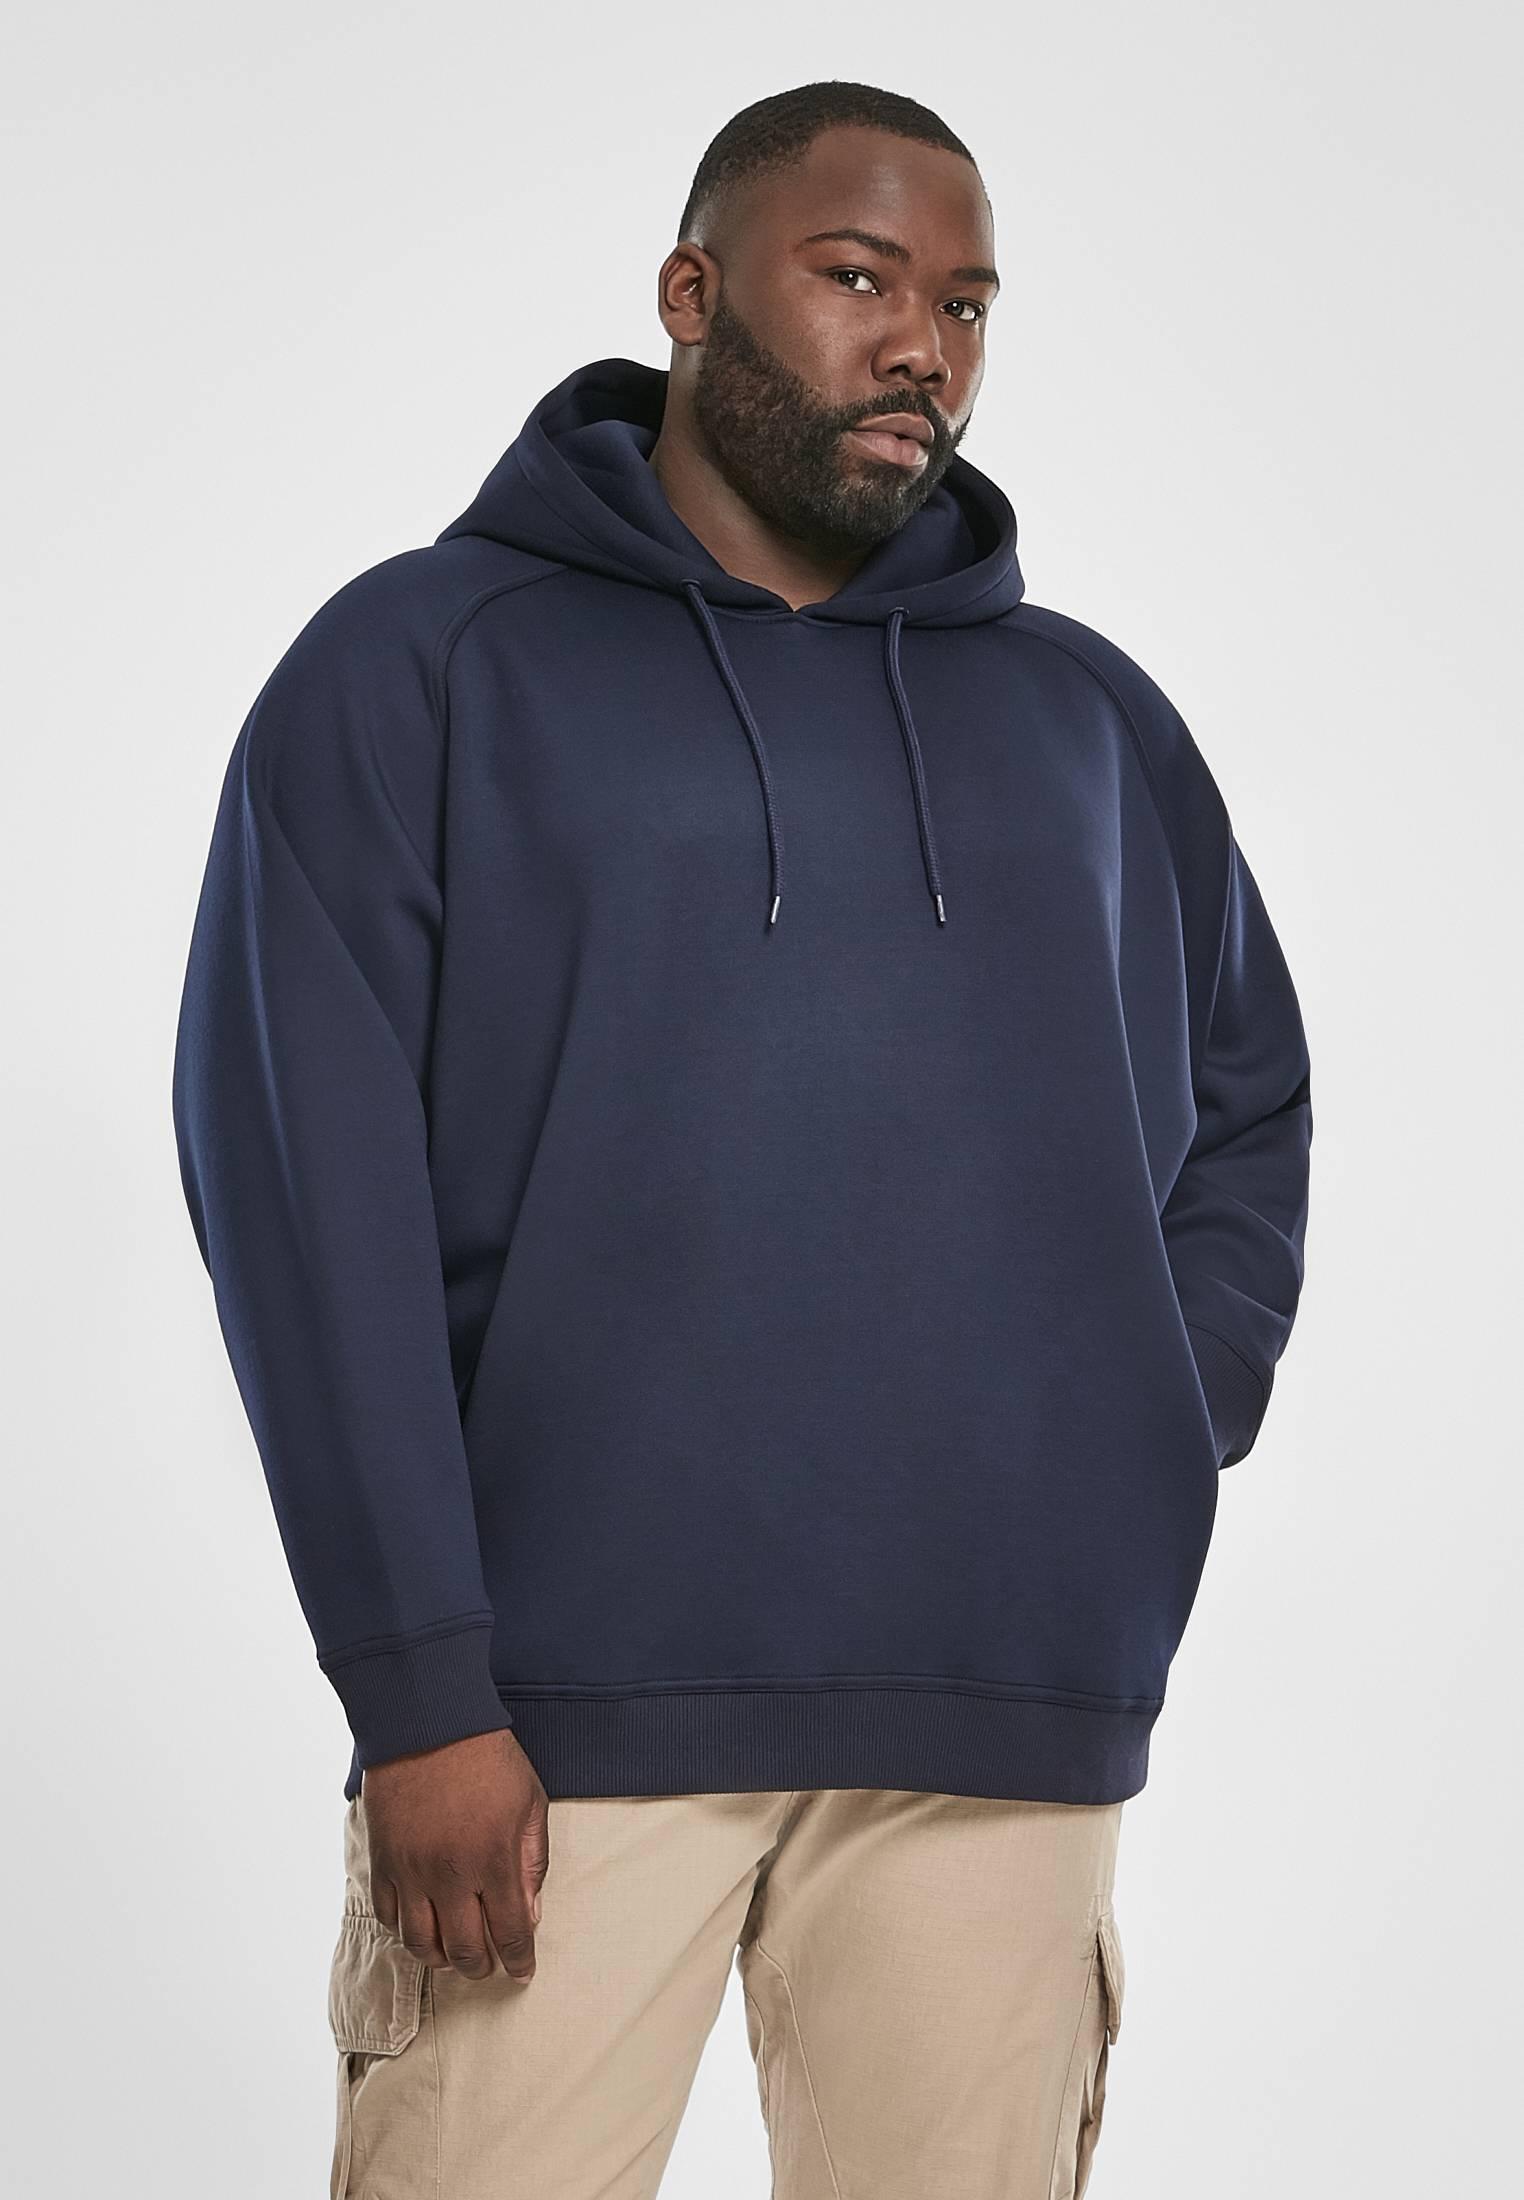 Urban Classics Raglan Zip Pocket Hoody midnightnavy - 3XL